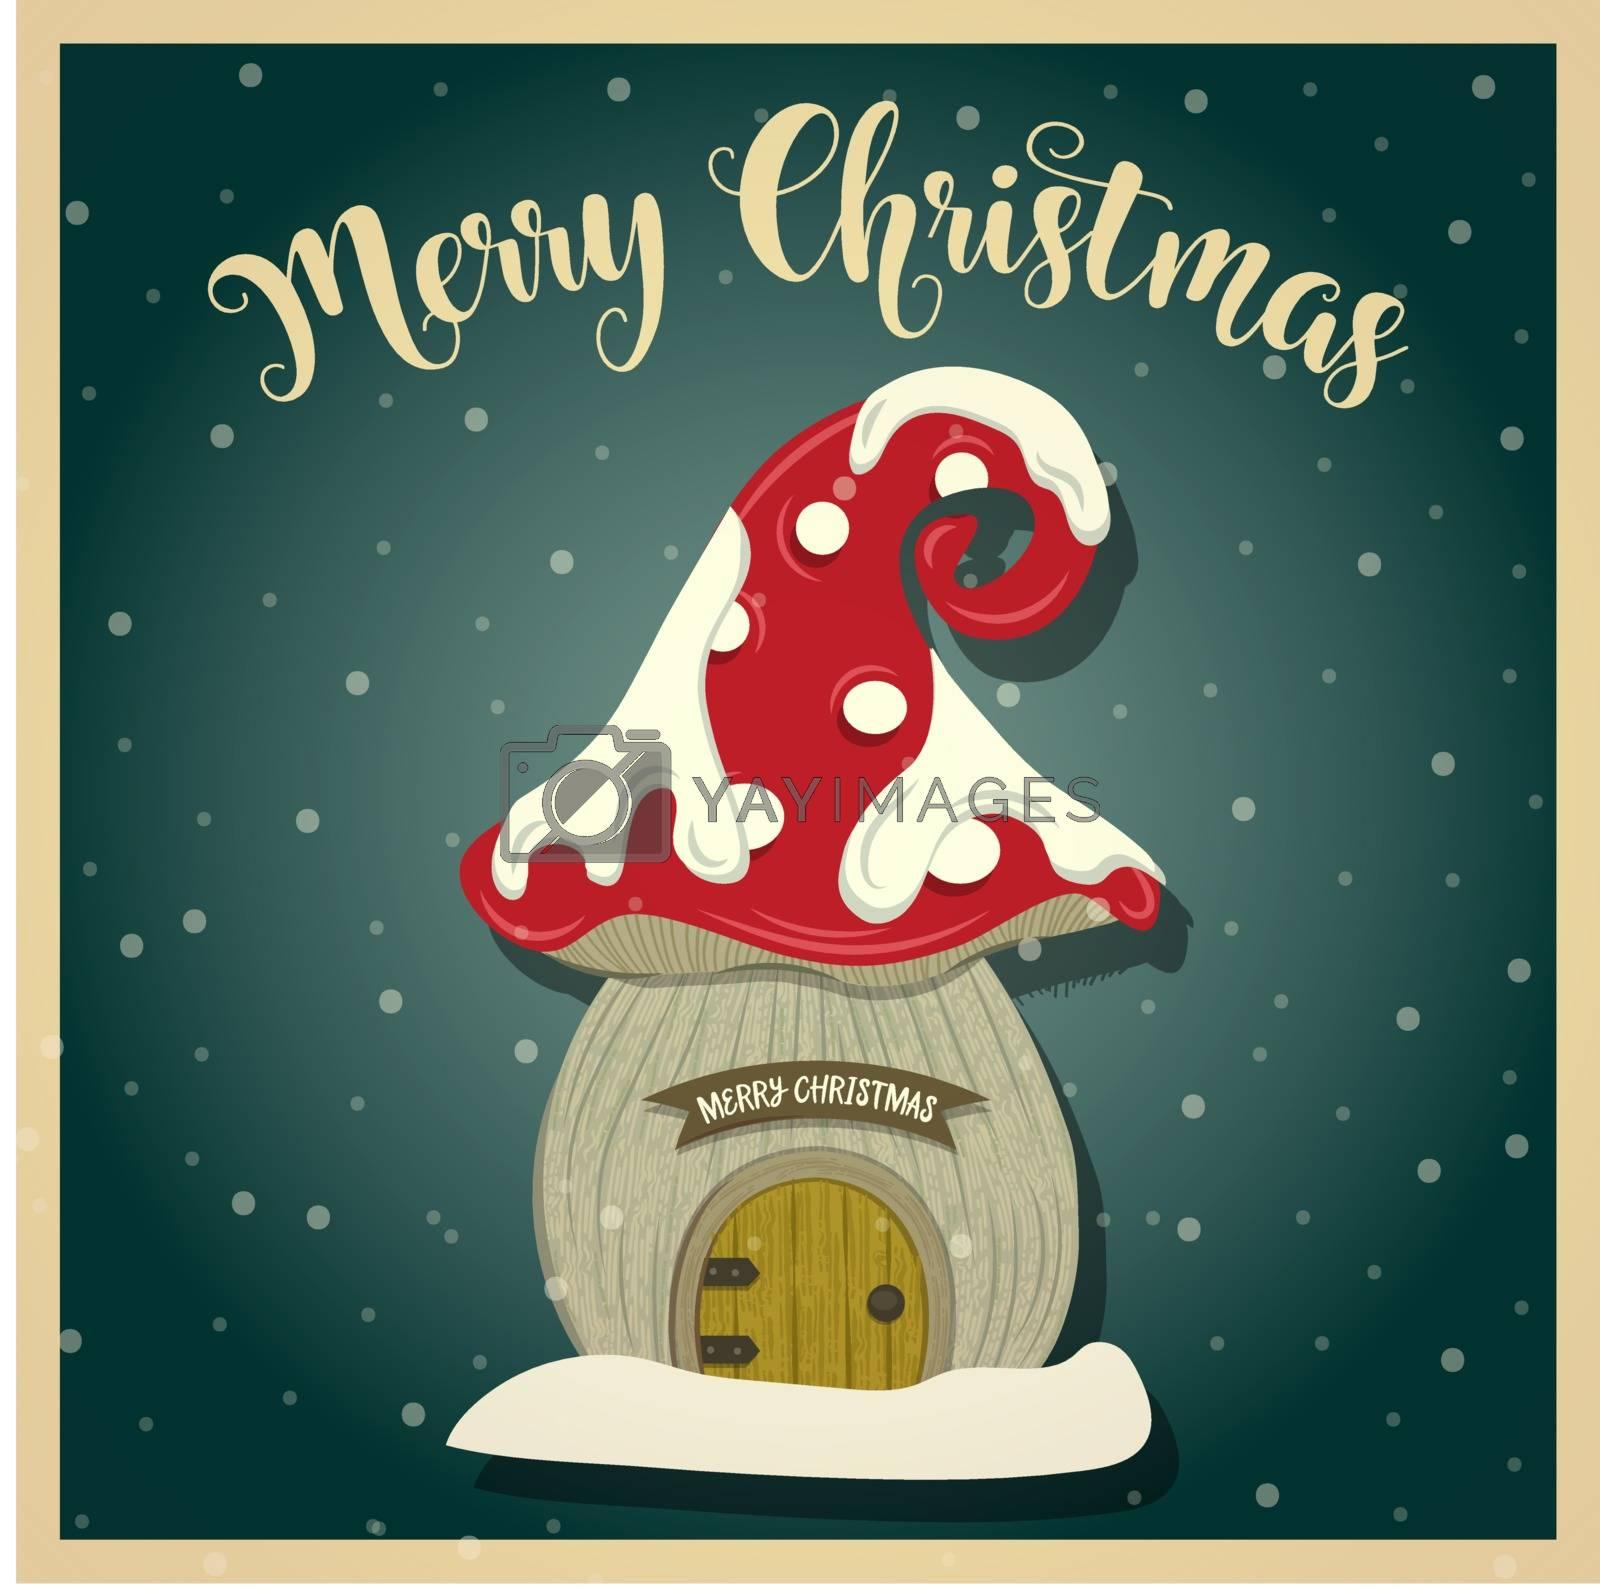 Vintage  Christmas card with gnome house. Christmas poster. Print. Vector